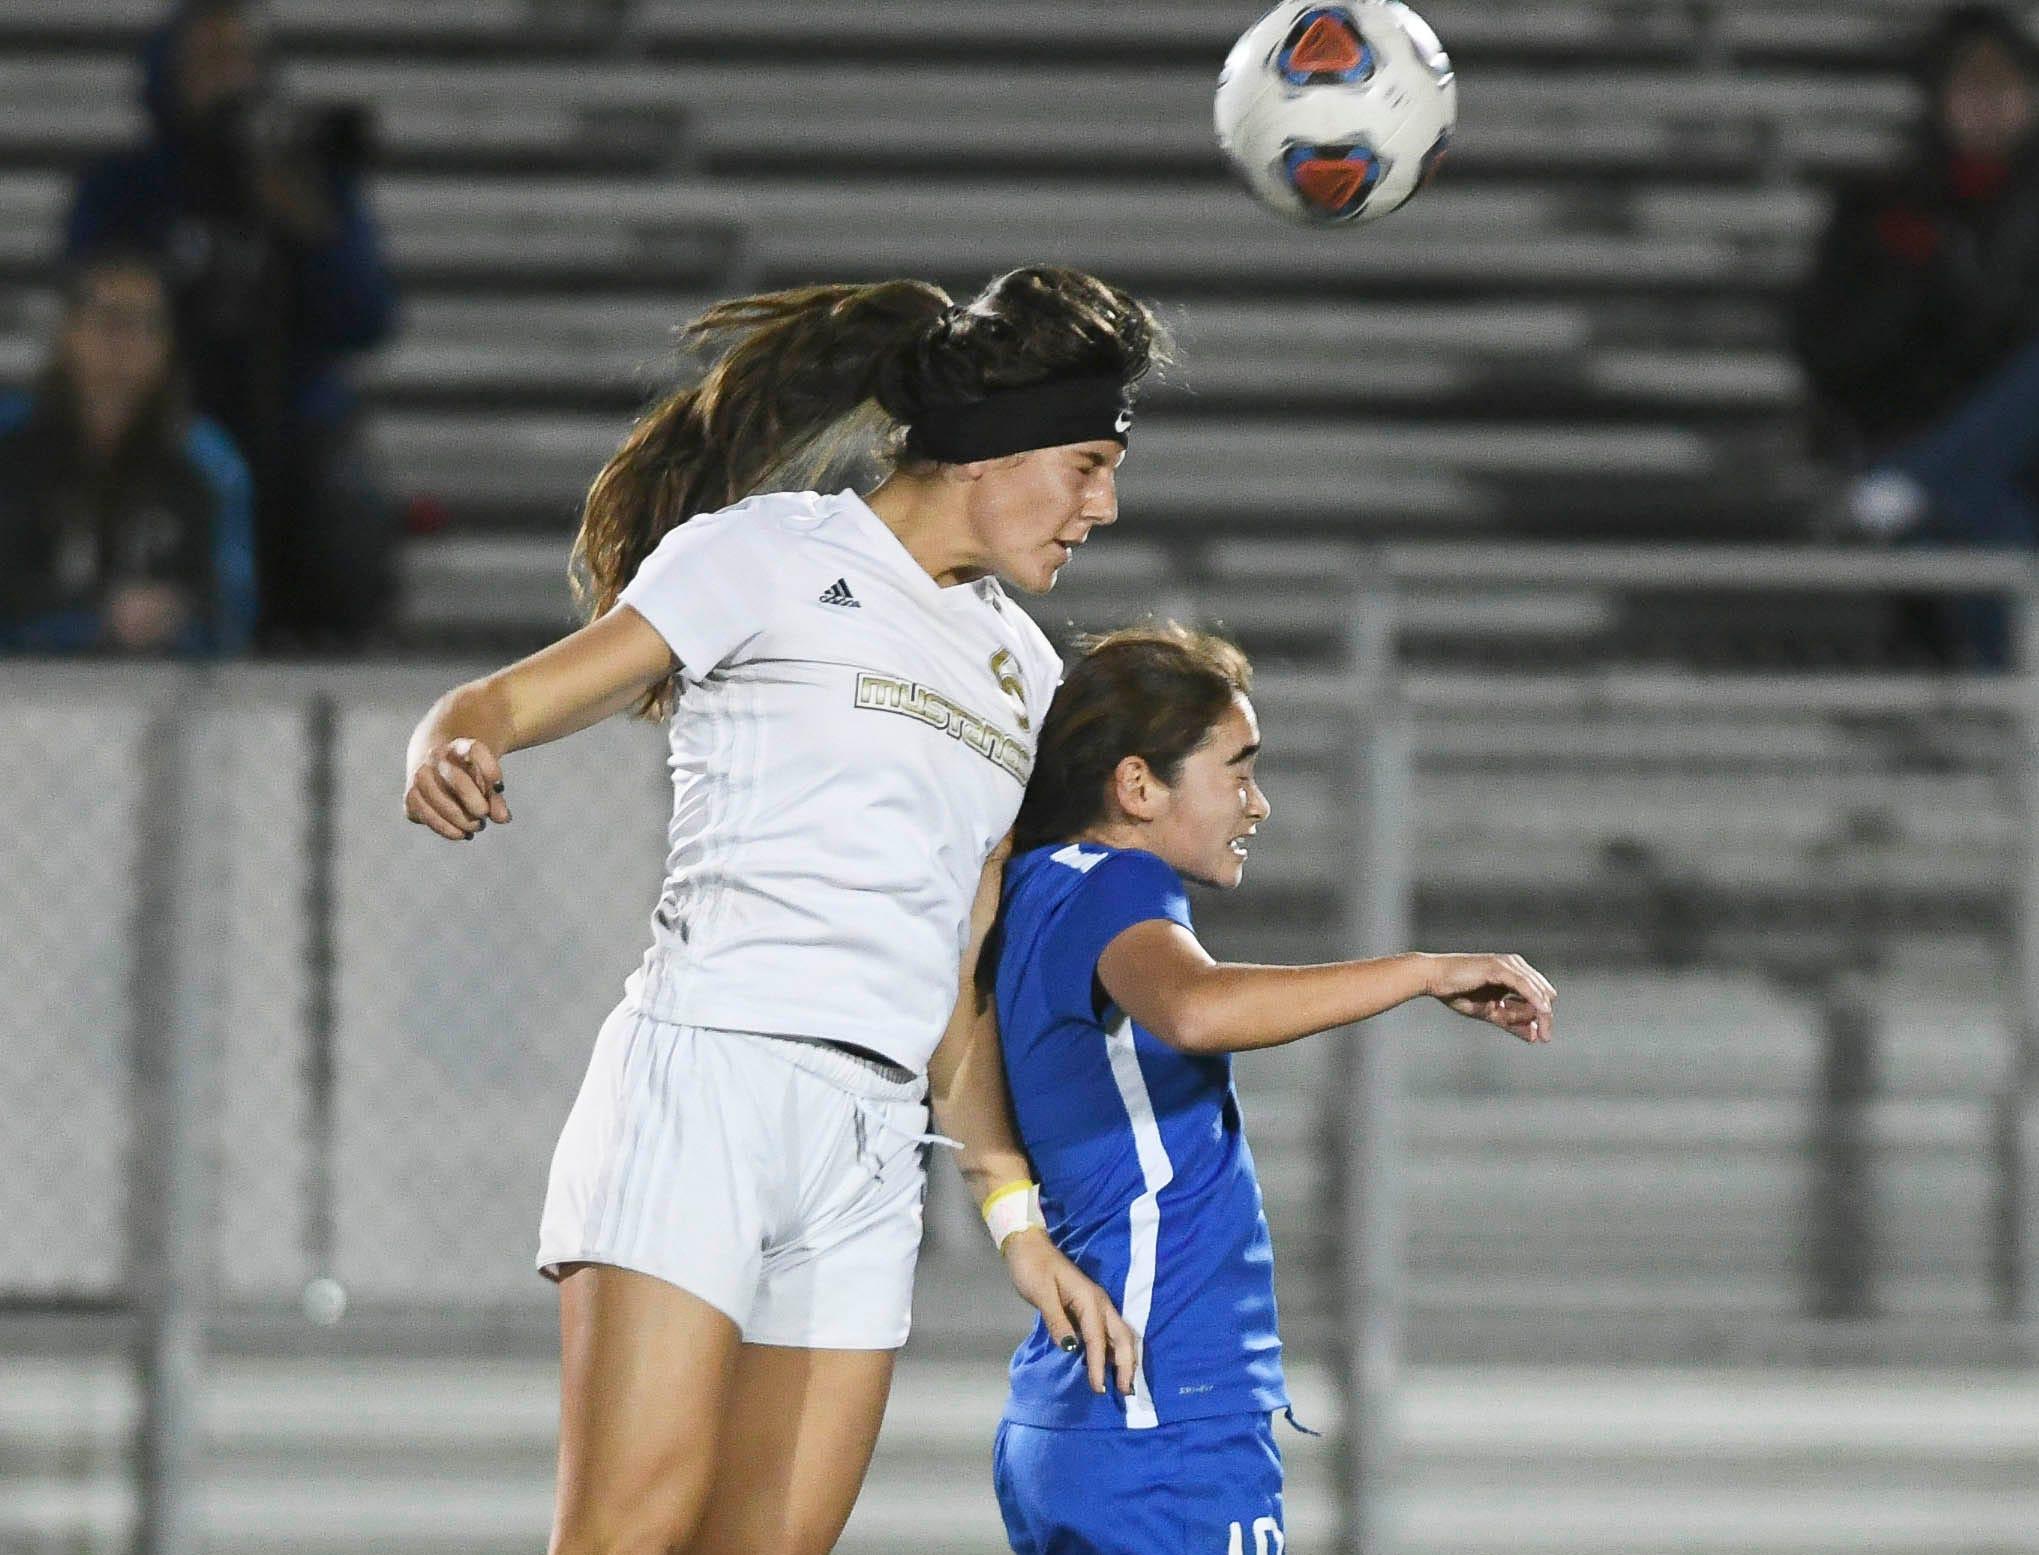 Lexy Denaburg of Merritt Island heads the ball over Adrianne Gutman of Titusville during Tuesday's District 12, Class 3A soccer semifinal.